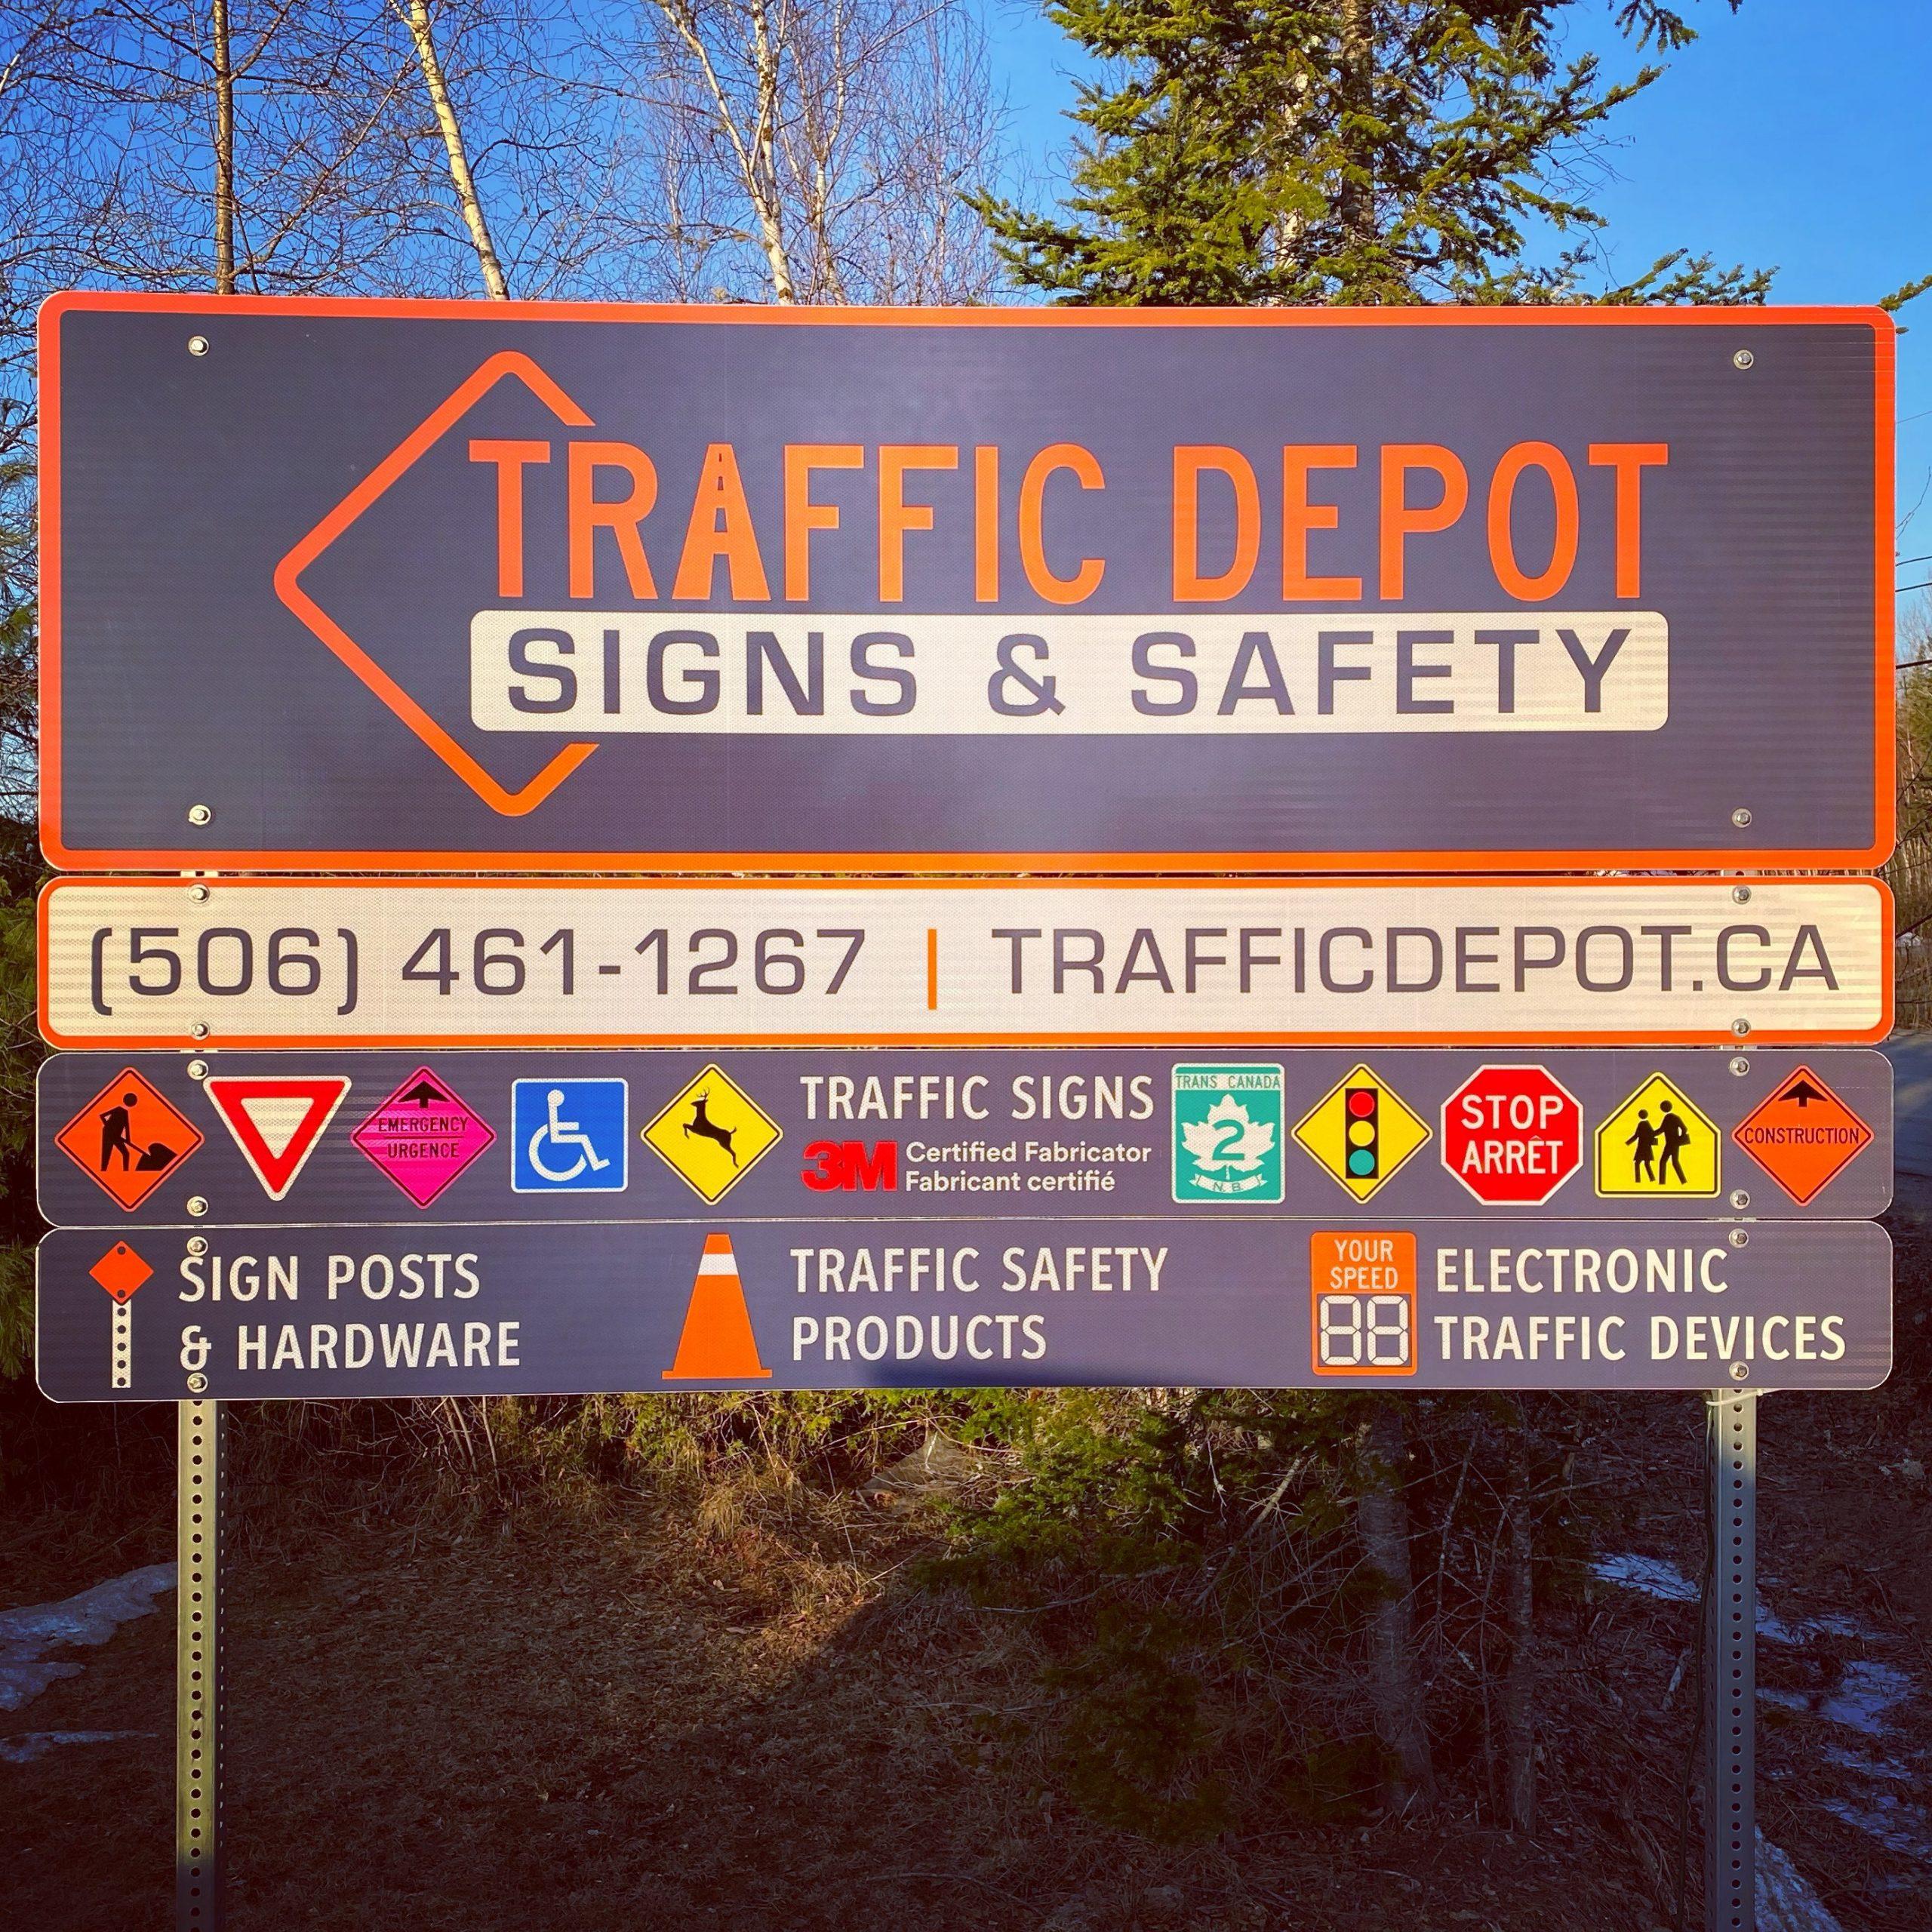 Traffic Depot Road Sign